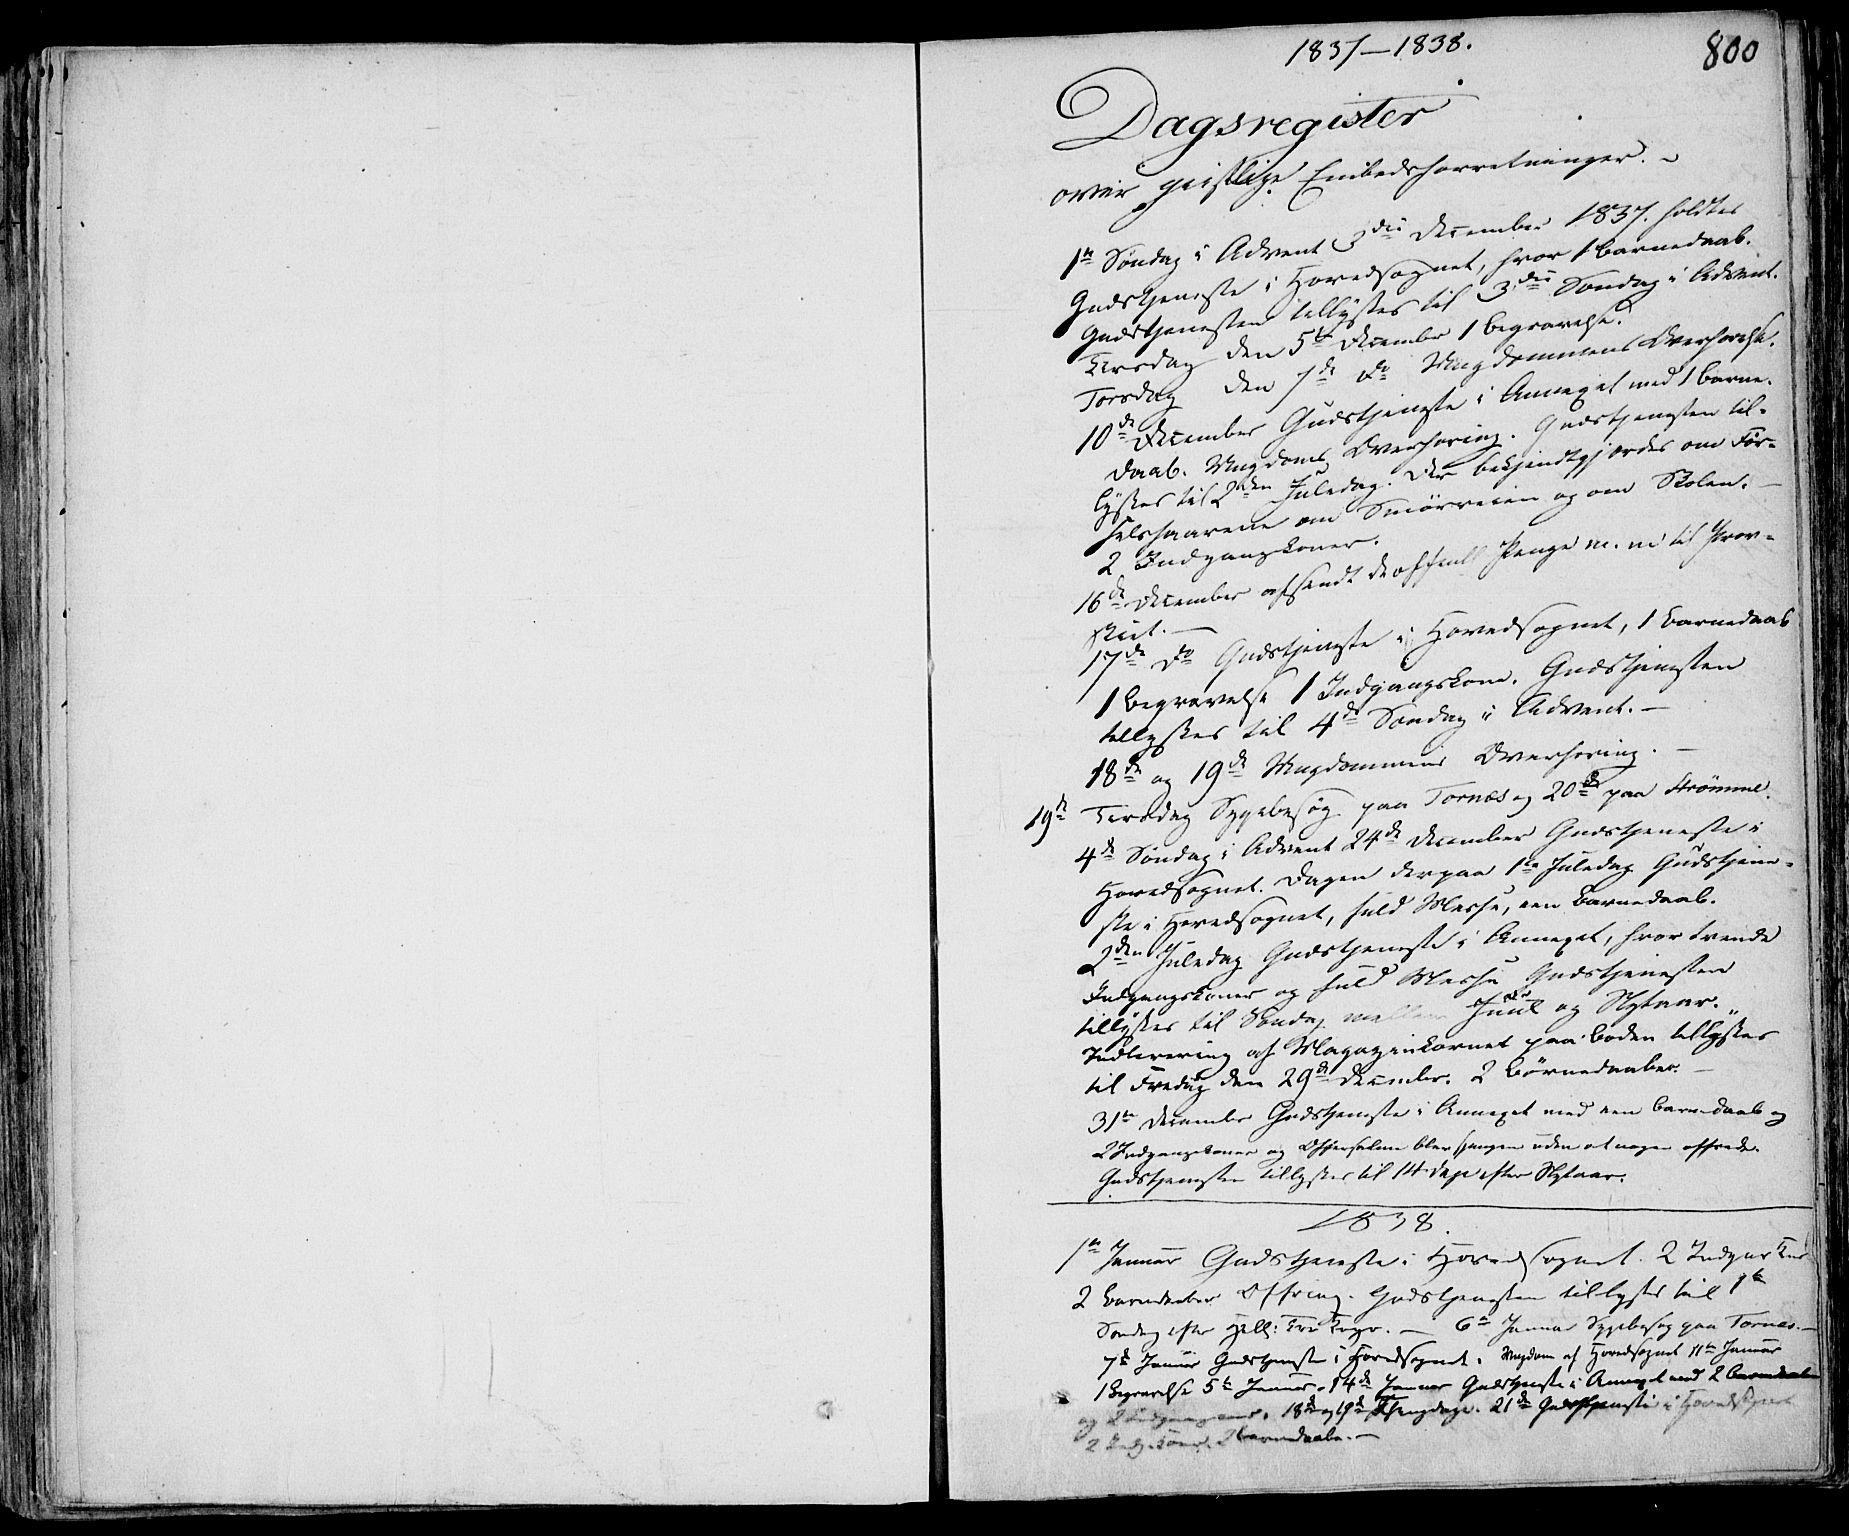 SAKO, Drangedal kirkebøker, F/Fa/L0007b: Ministerialbok nr. 7b, 1837-1856, s. 800